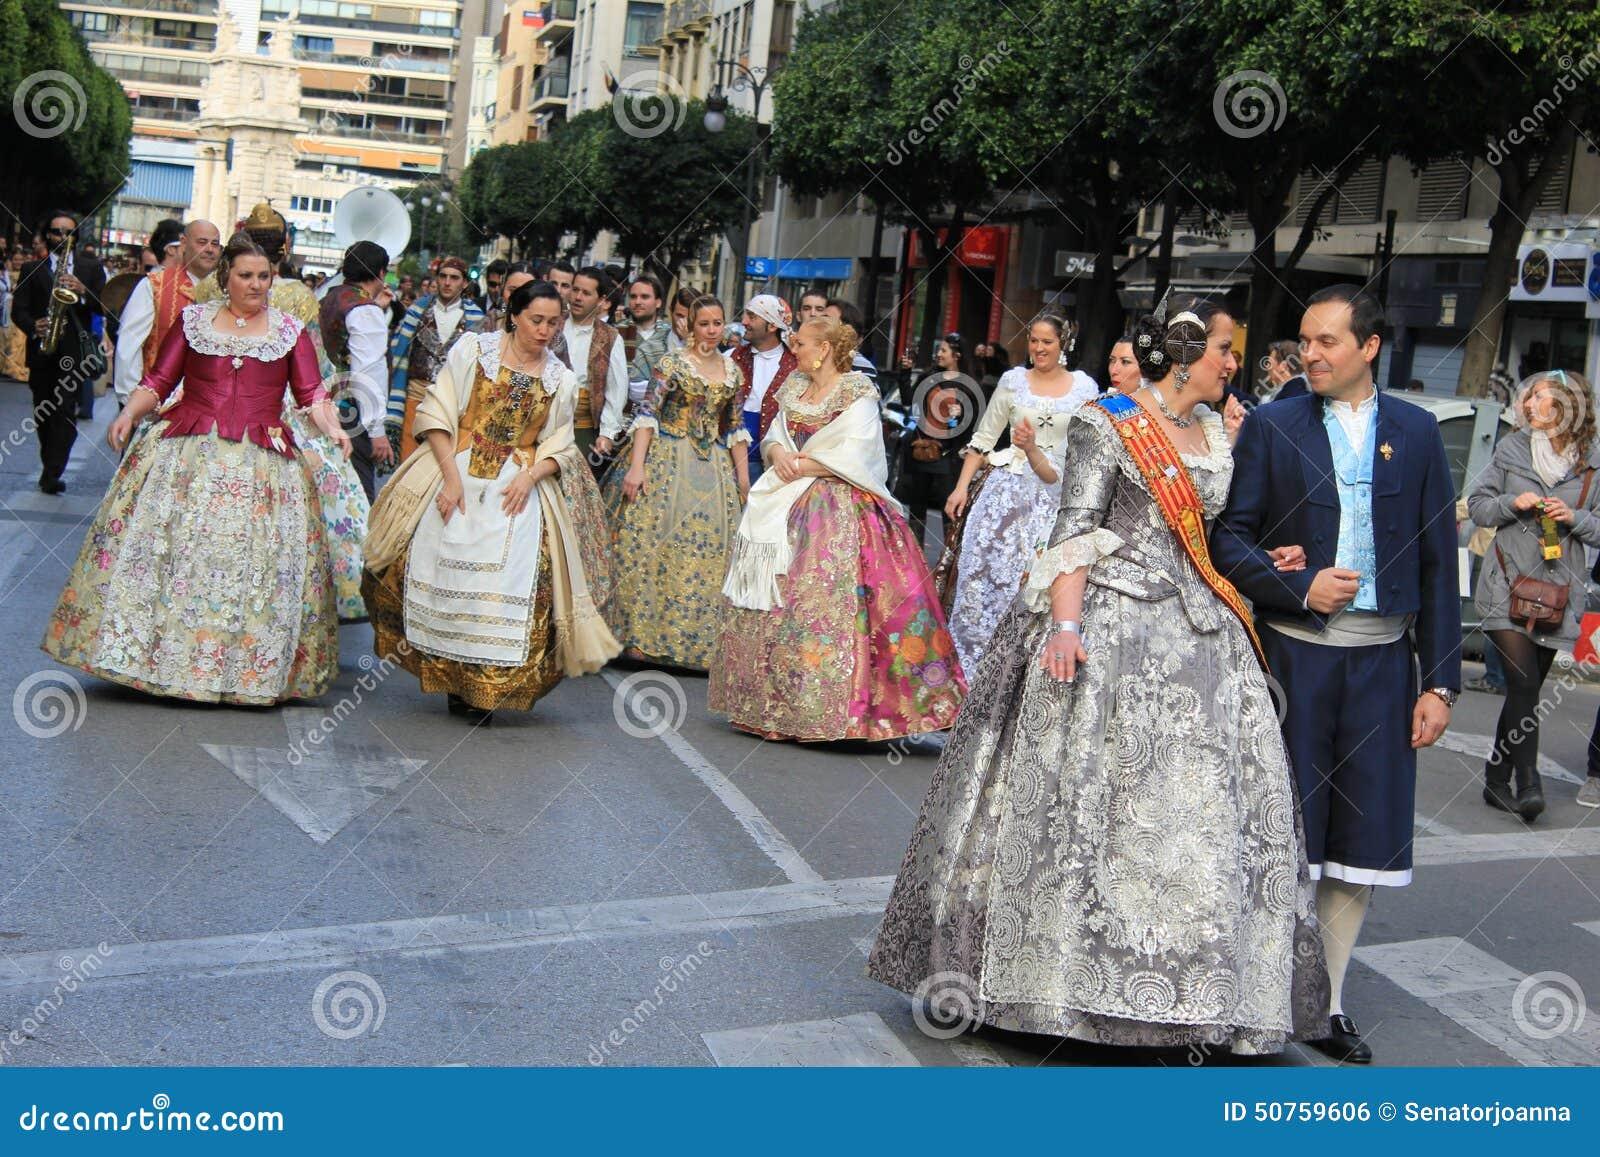 valencia single girls Meet thousands of beautiful single girls online seeking guys for dating, love, marriage in spain.